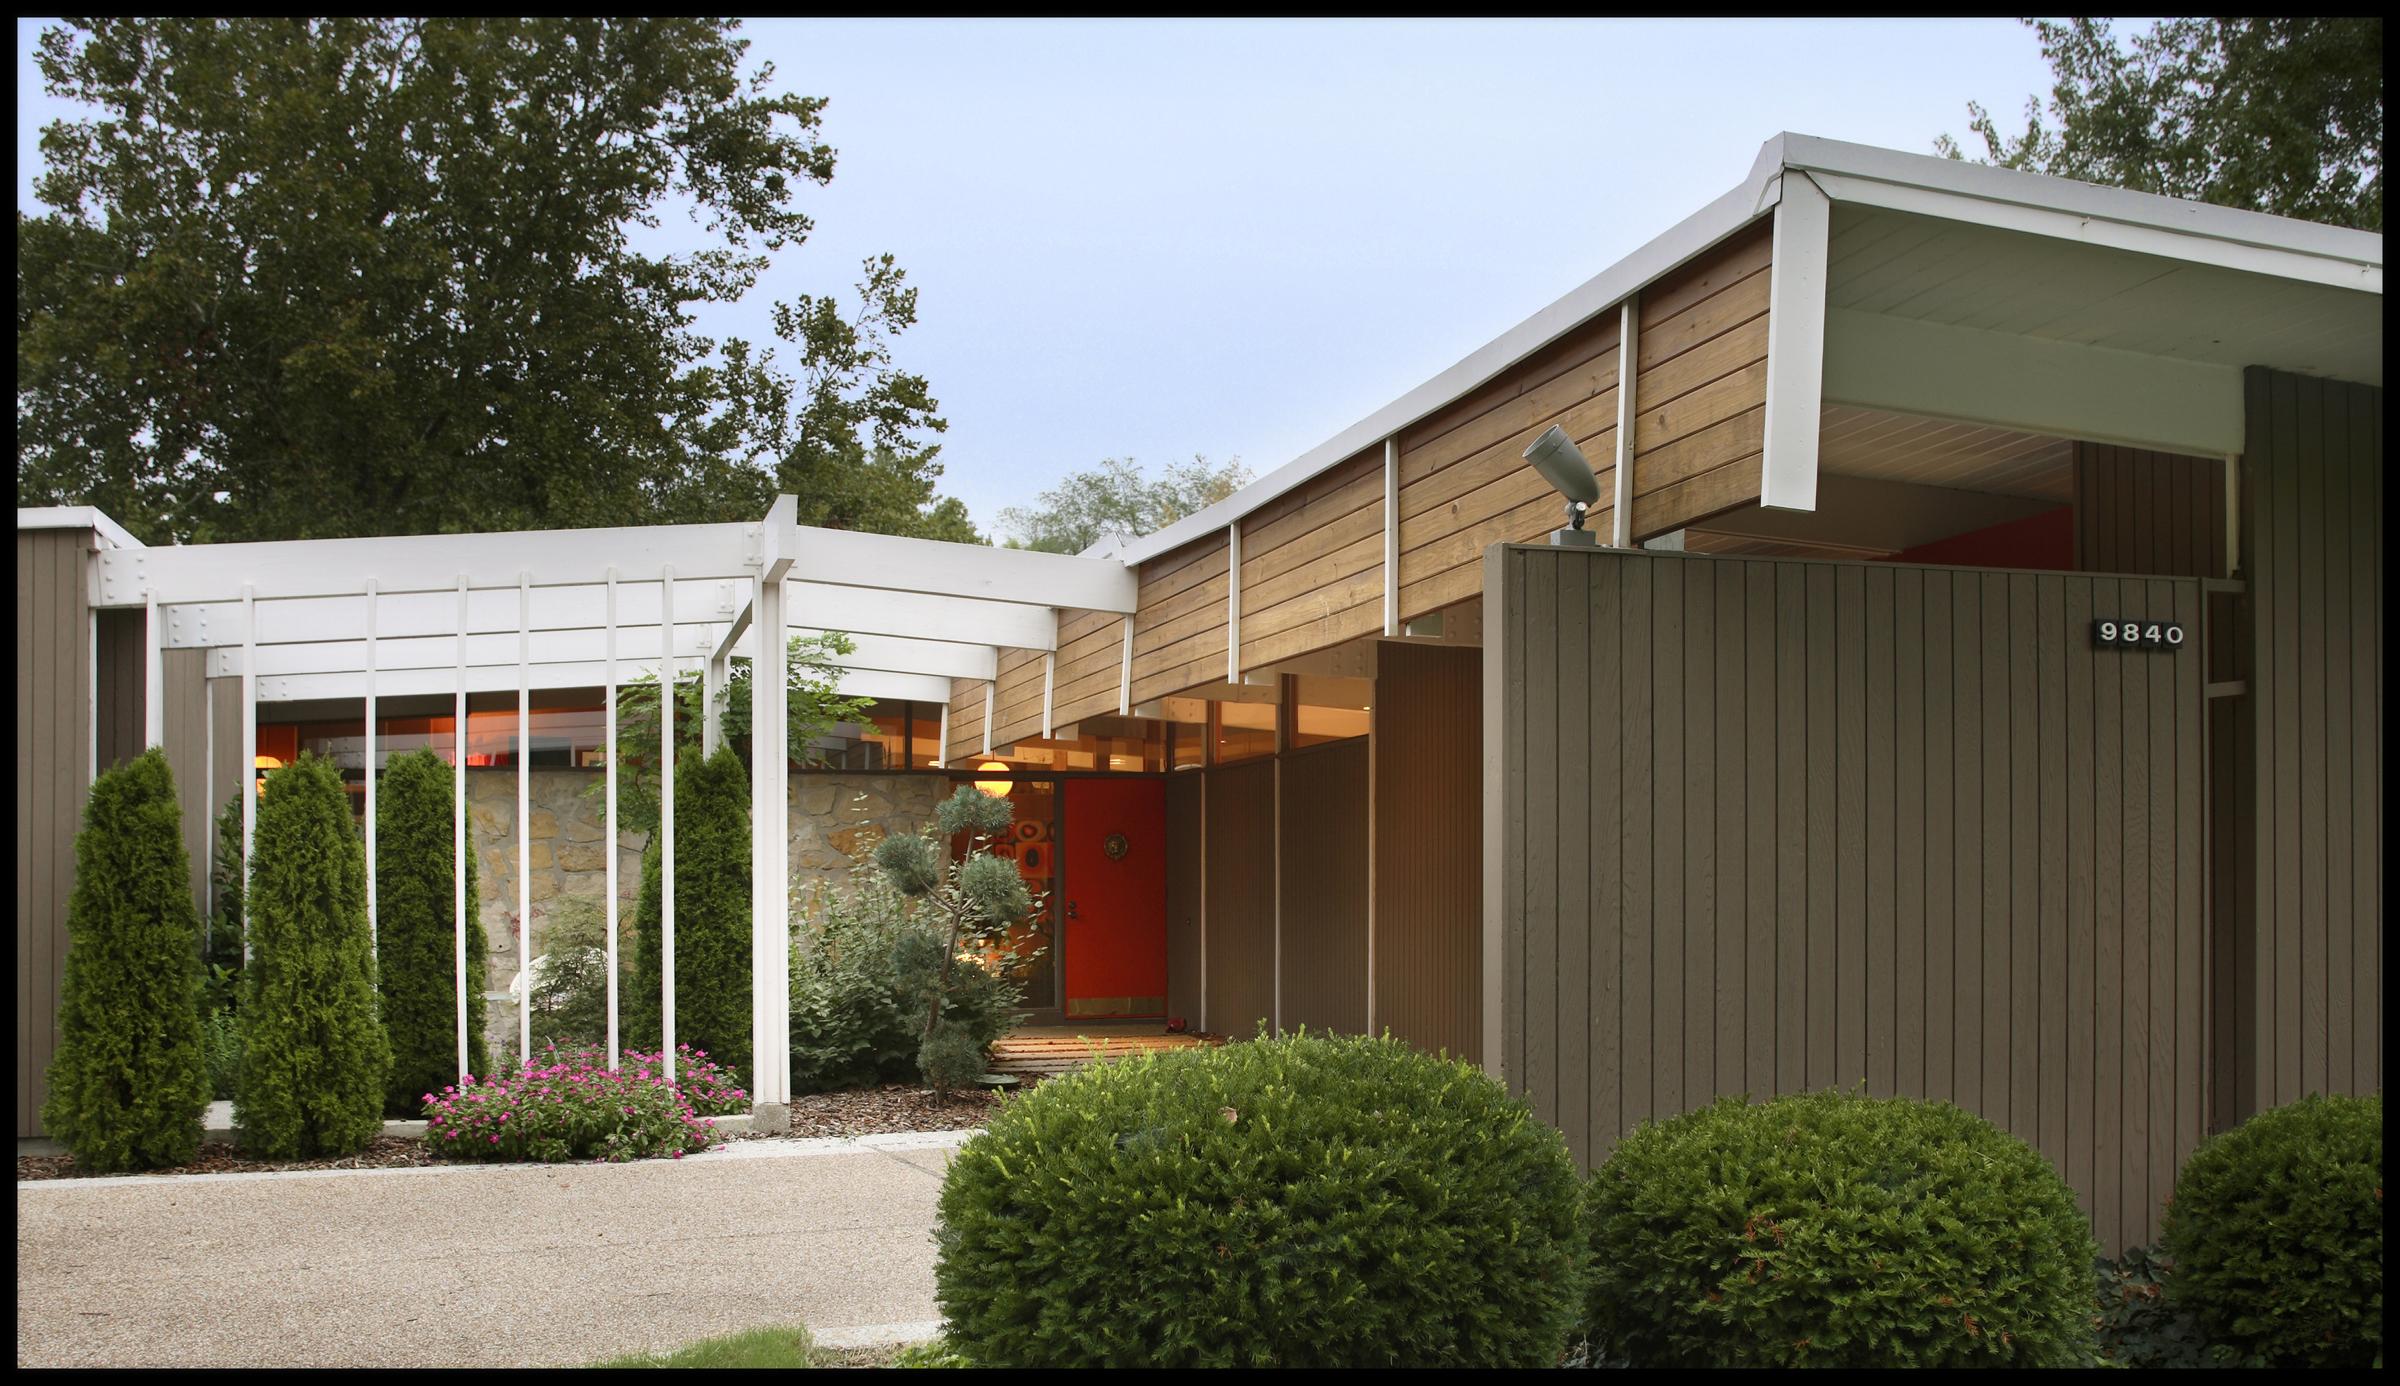 Castilian - Architect, Jones & Emmons - Designed 1956